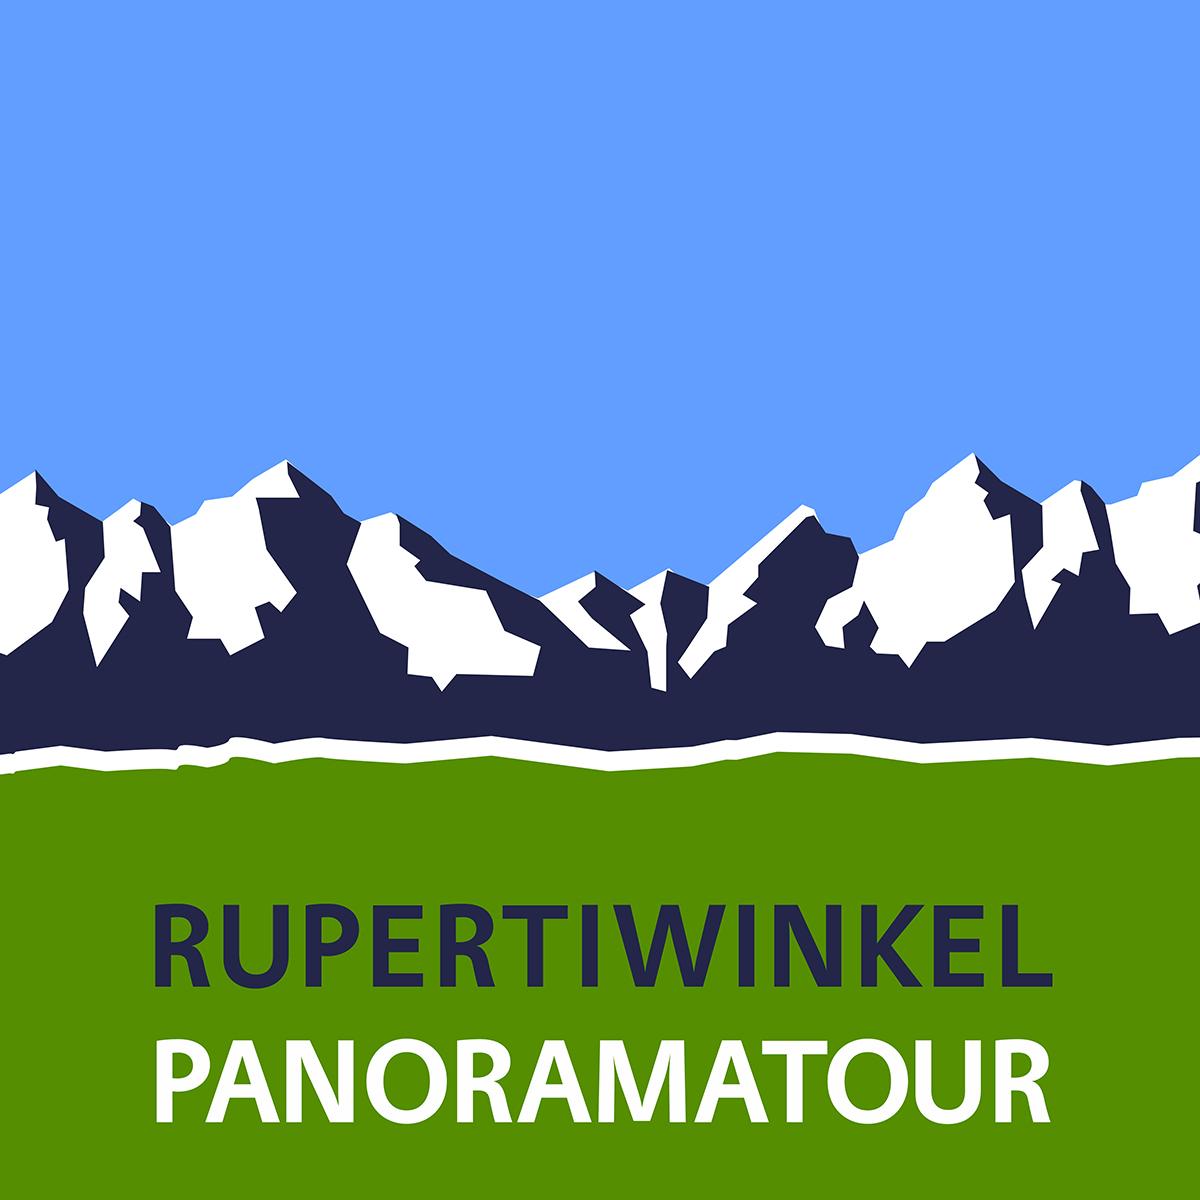 Rupertiwinkler Panoramatour